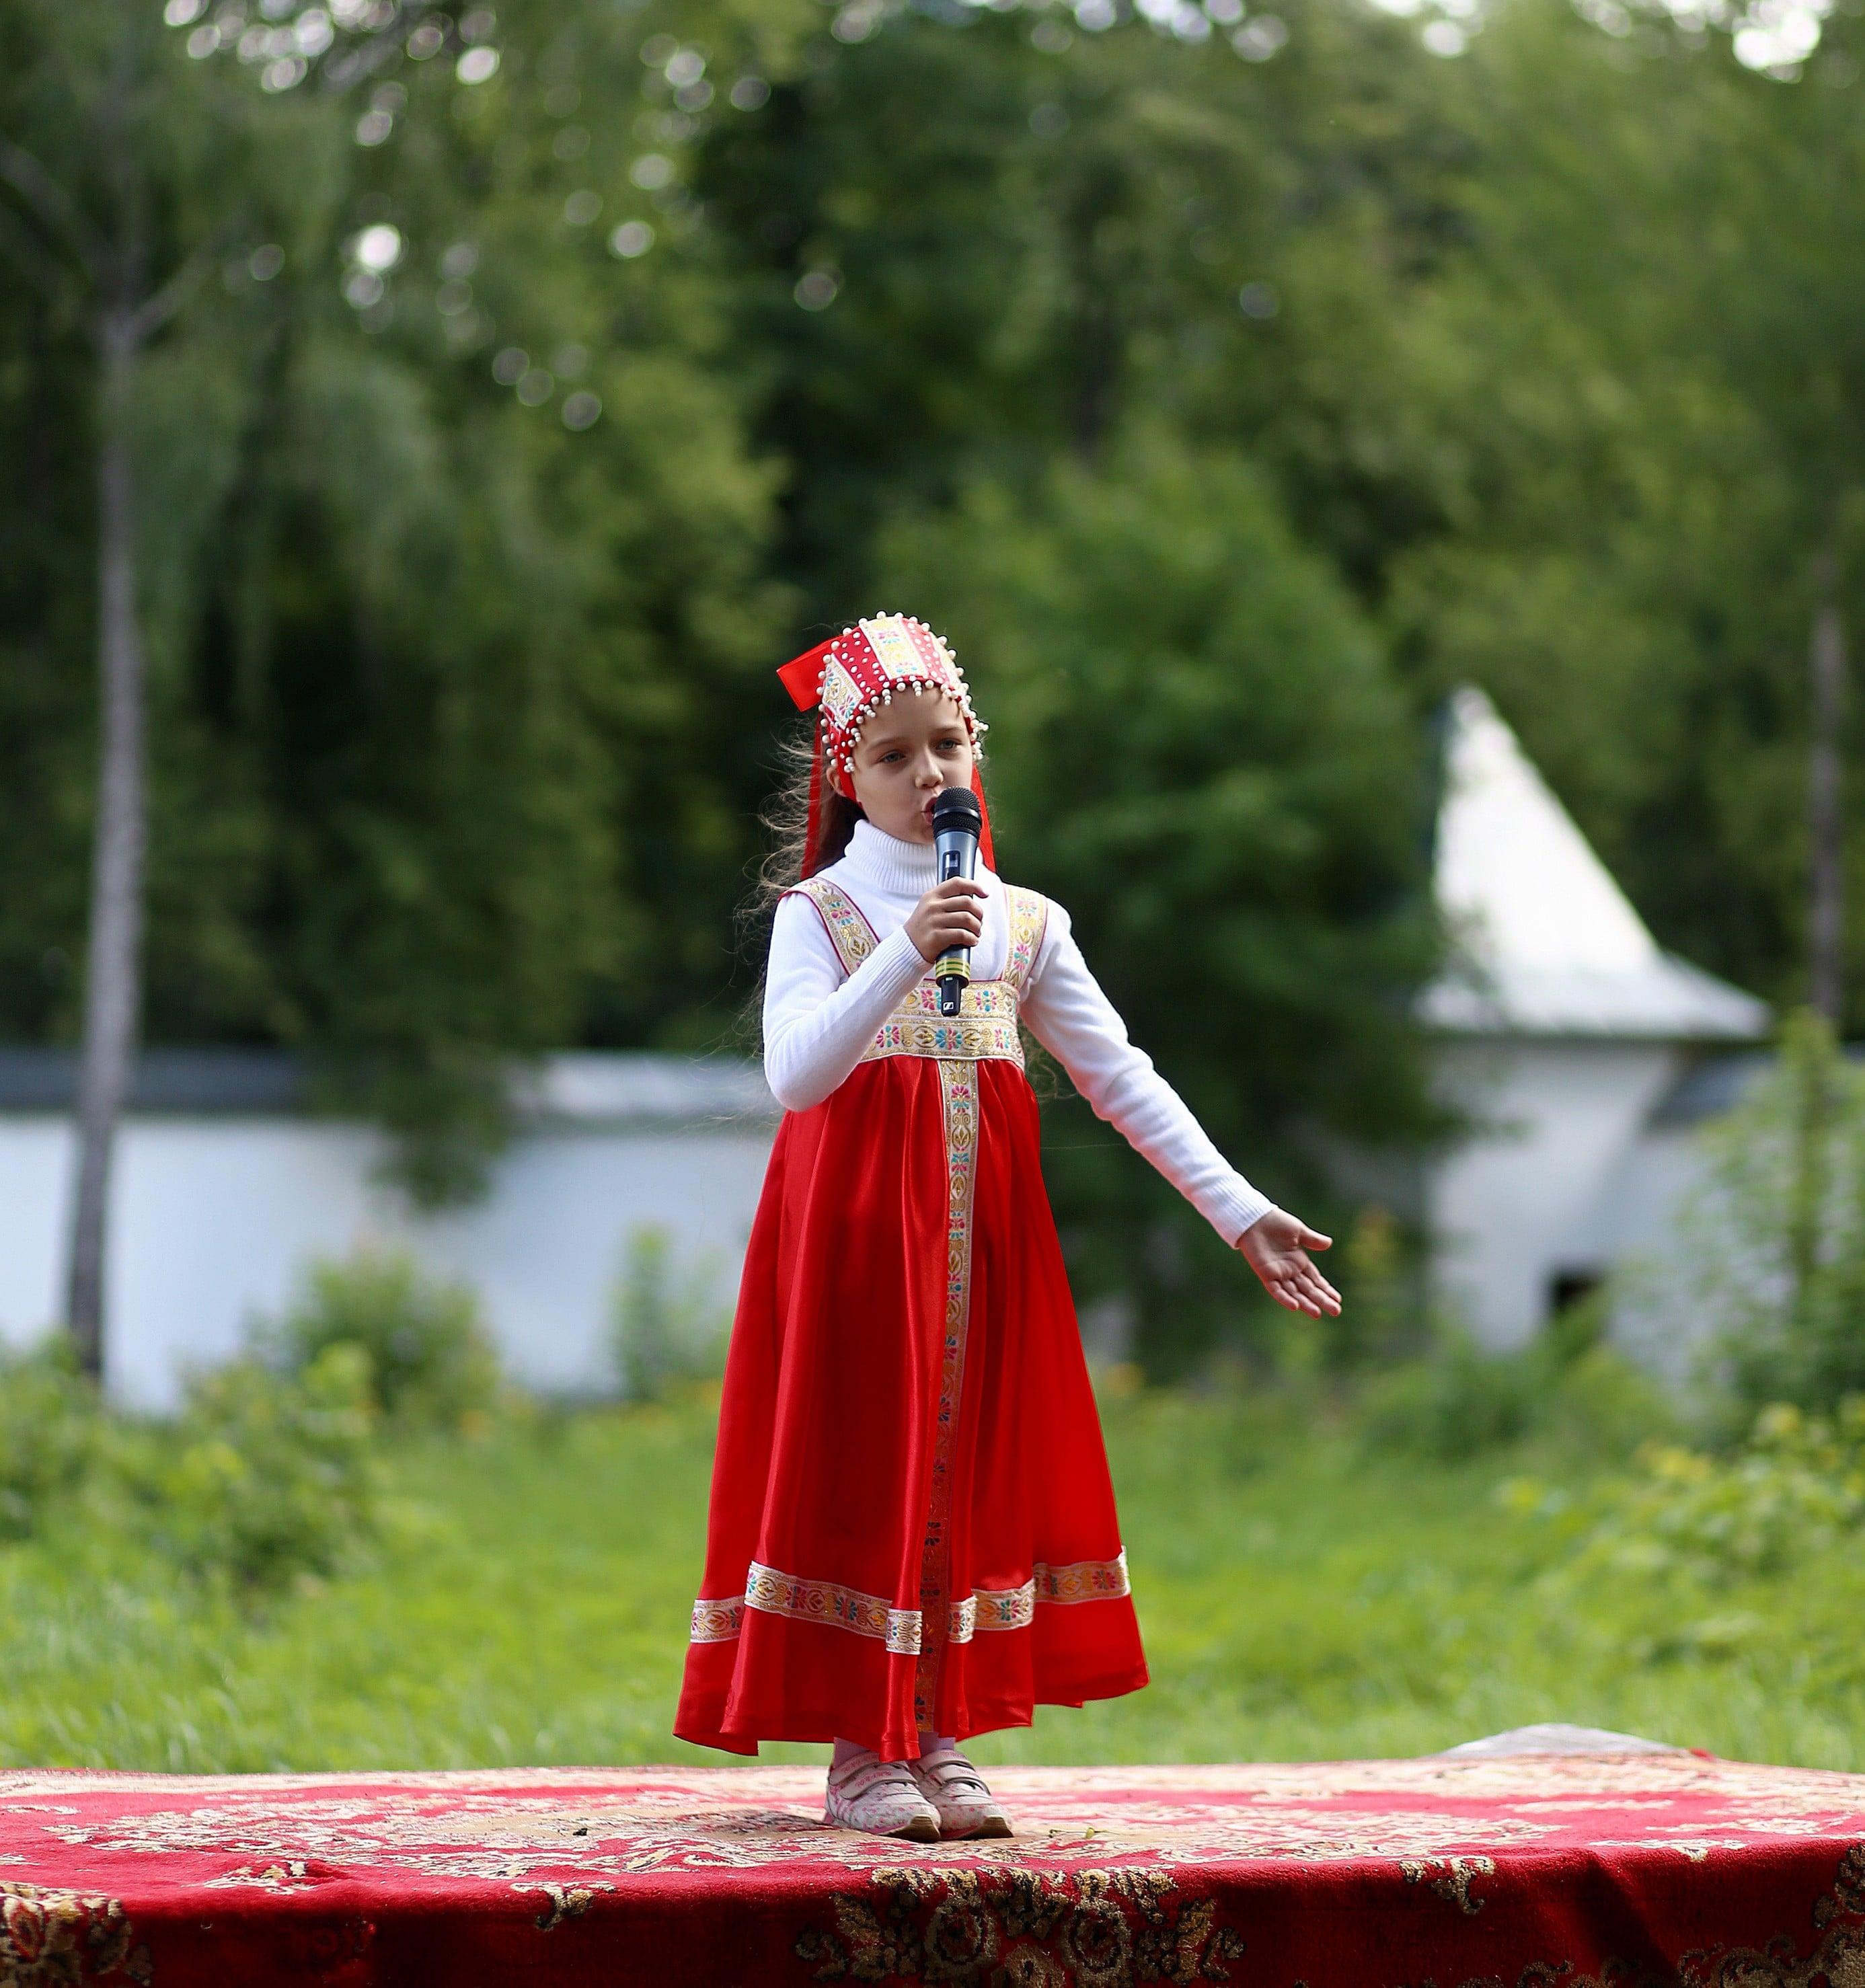 http://monuspen.ru/photoreports/14b72a43bf568736ebc953d1a903f320.jpg